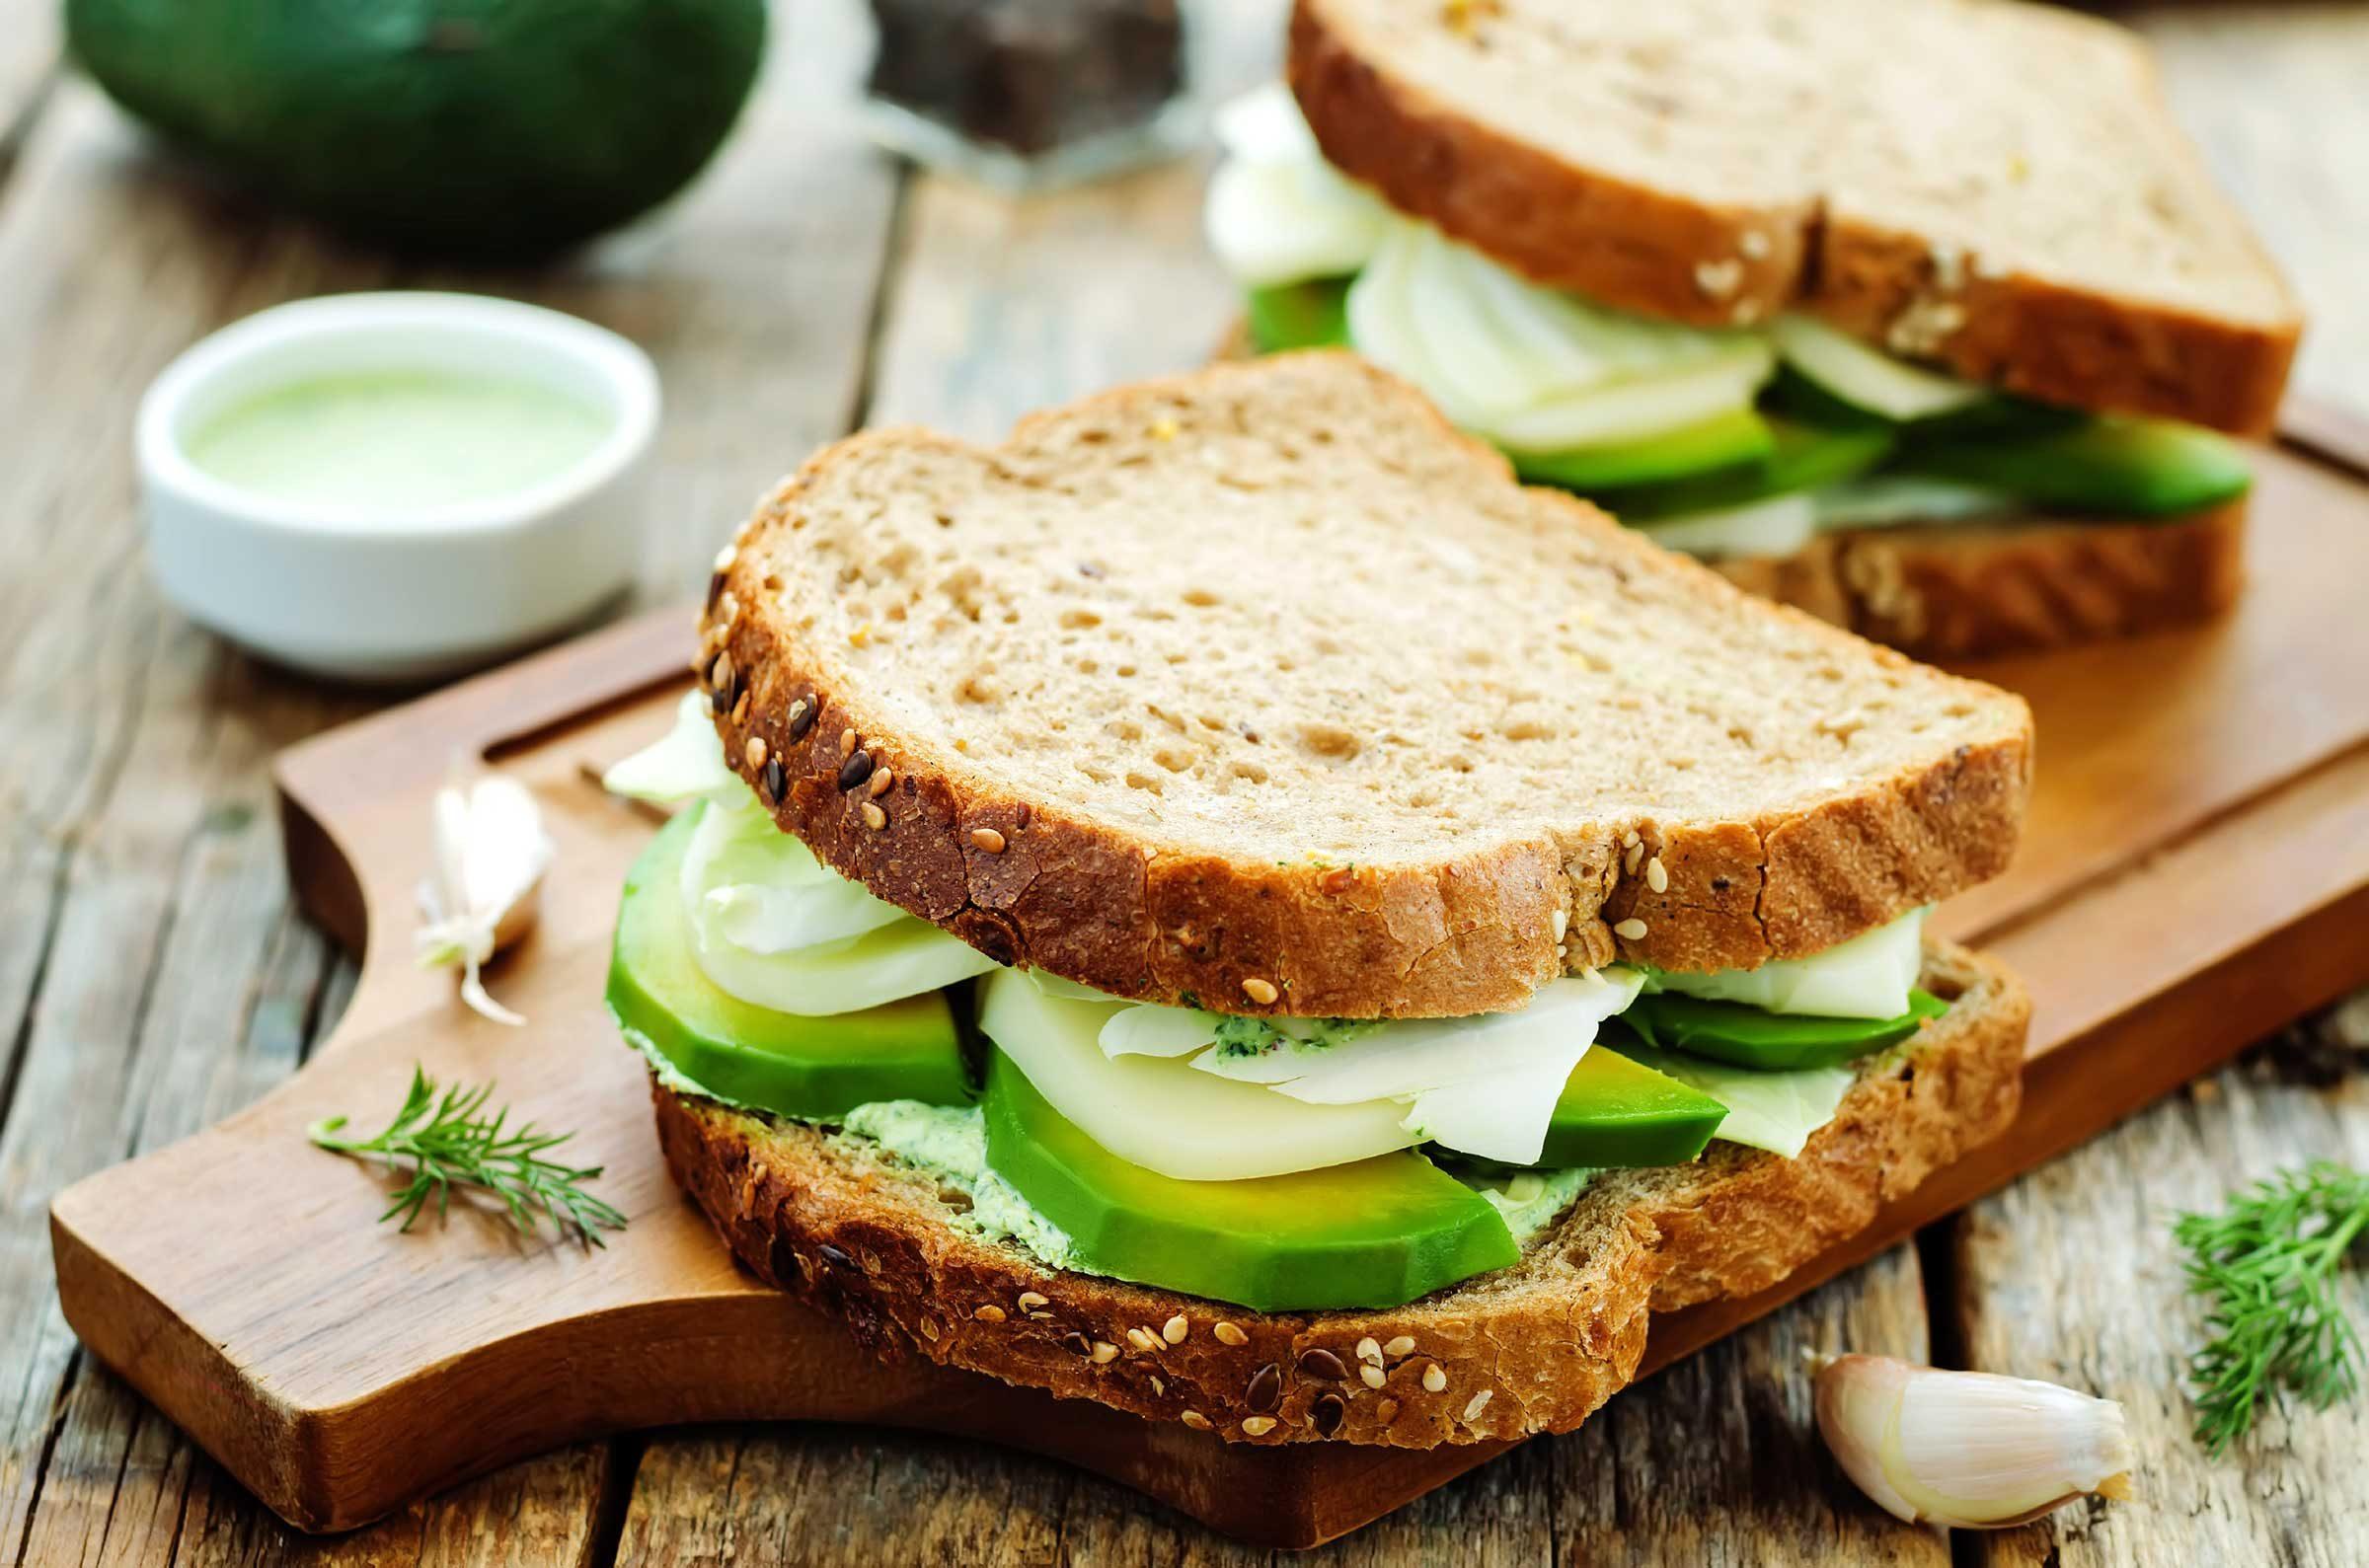 Healthy eating tips habits to start reader 39 s digest - Ideas cenas saludables ...